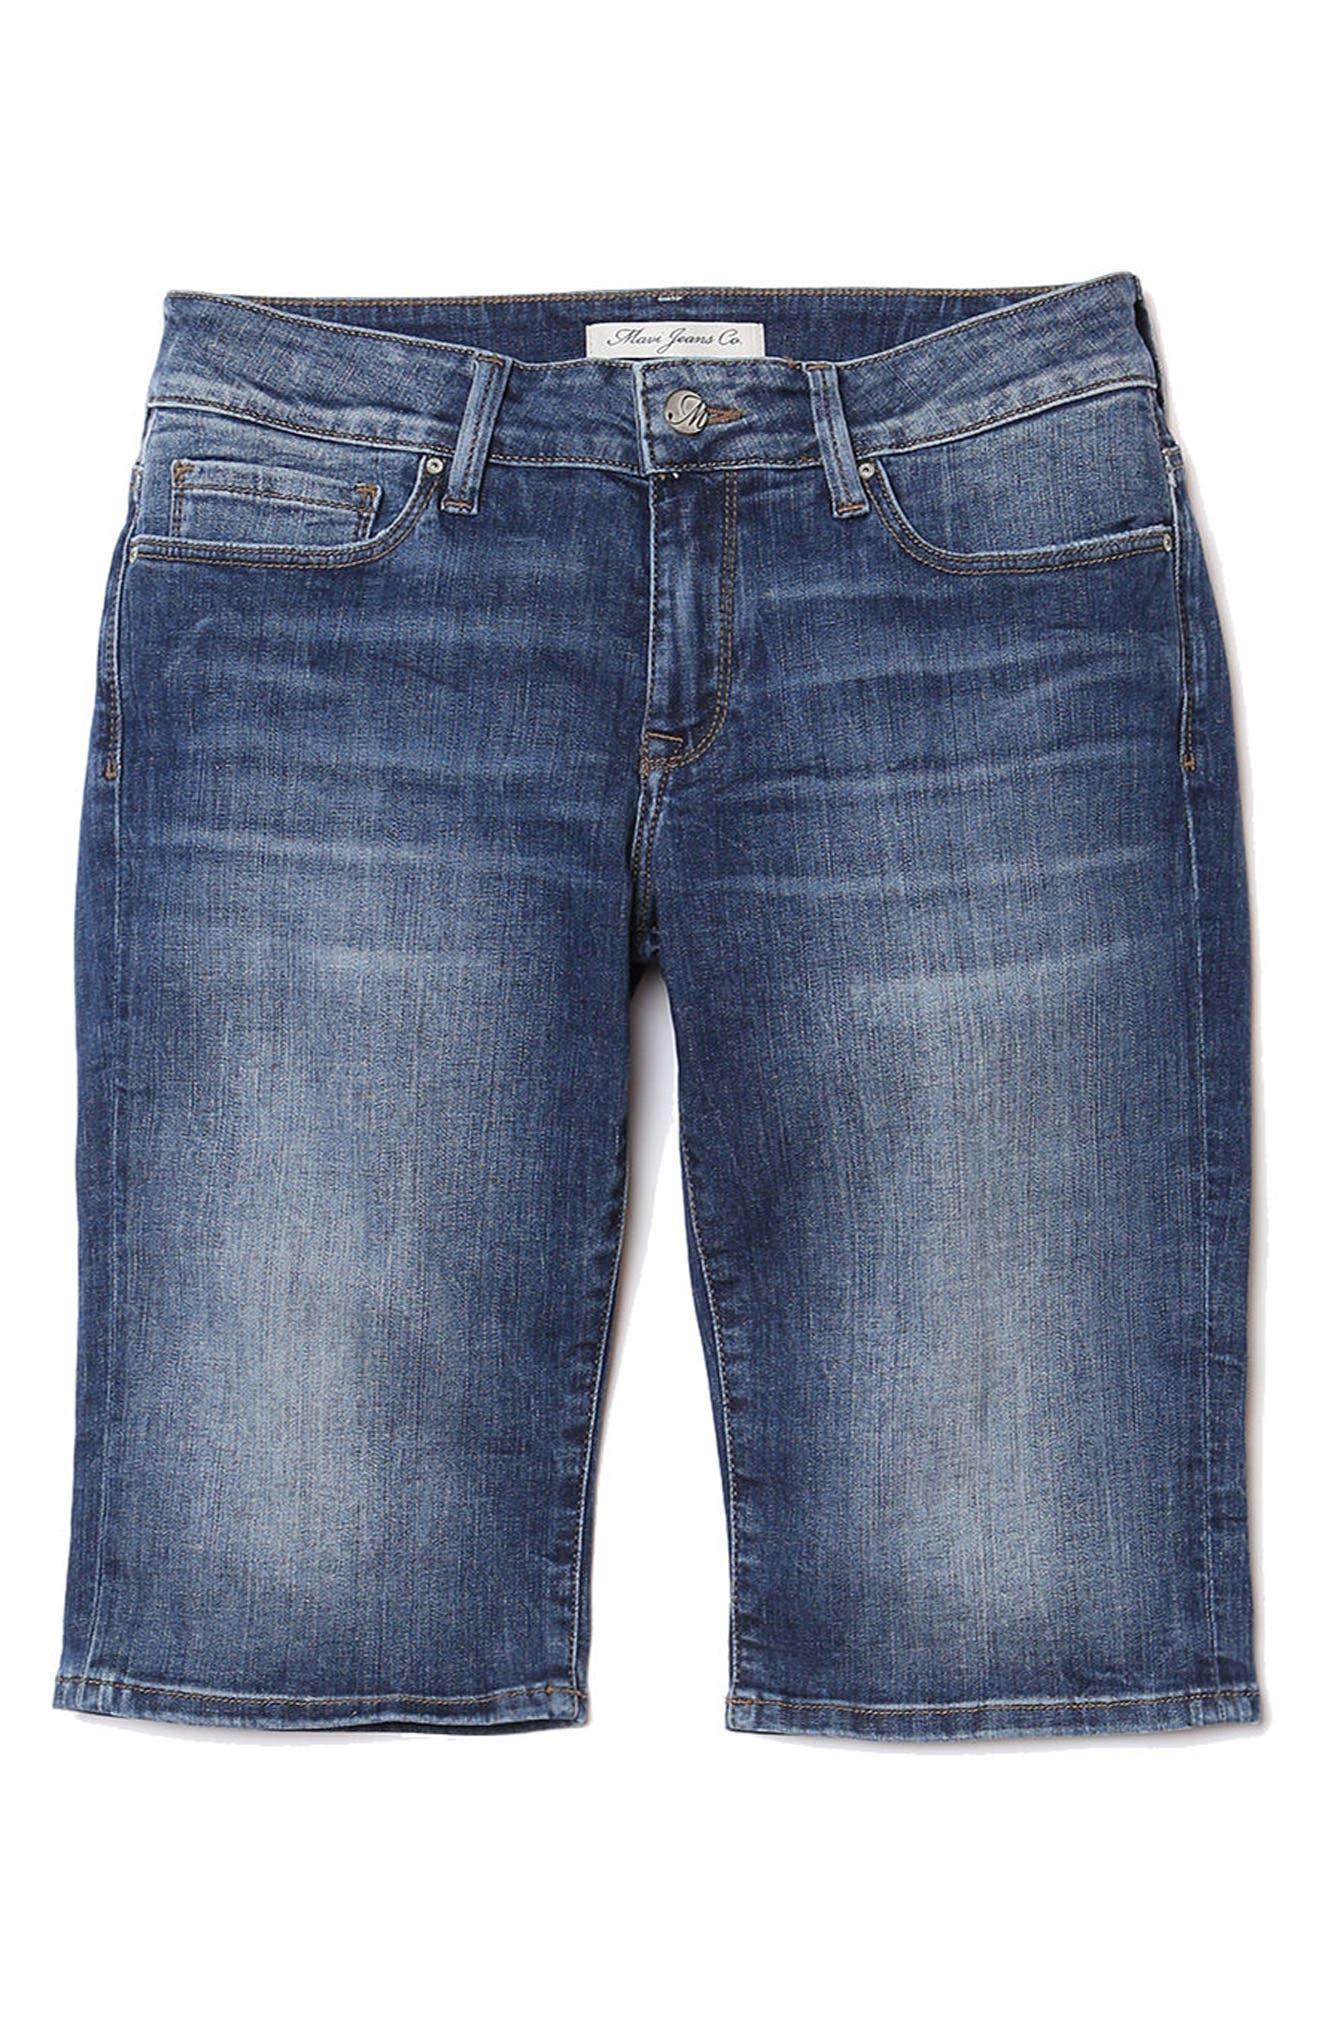 Karly Bermuda Shorts,                             Alternate thumbnail 4, color,                             DARK INDIGO TRIBECA